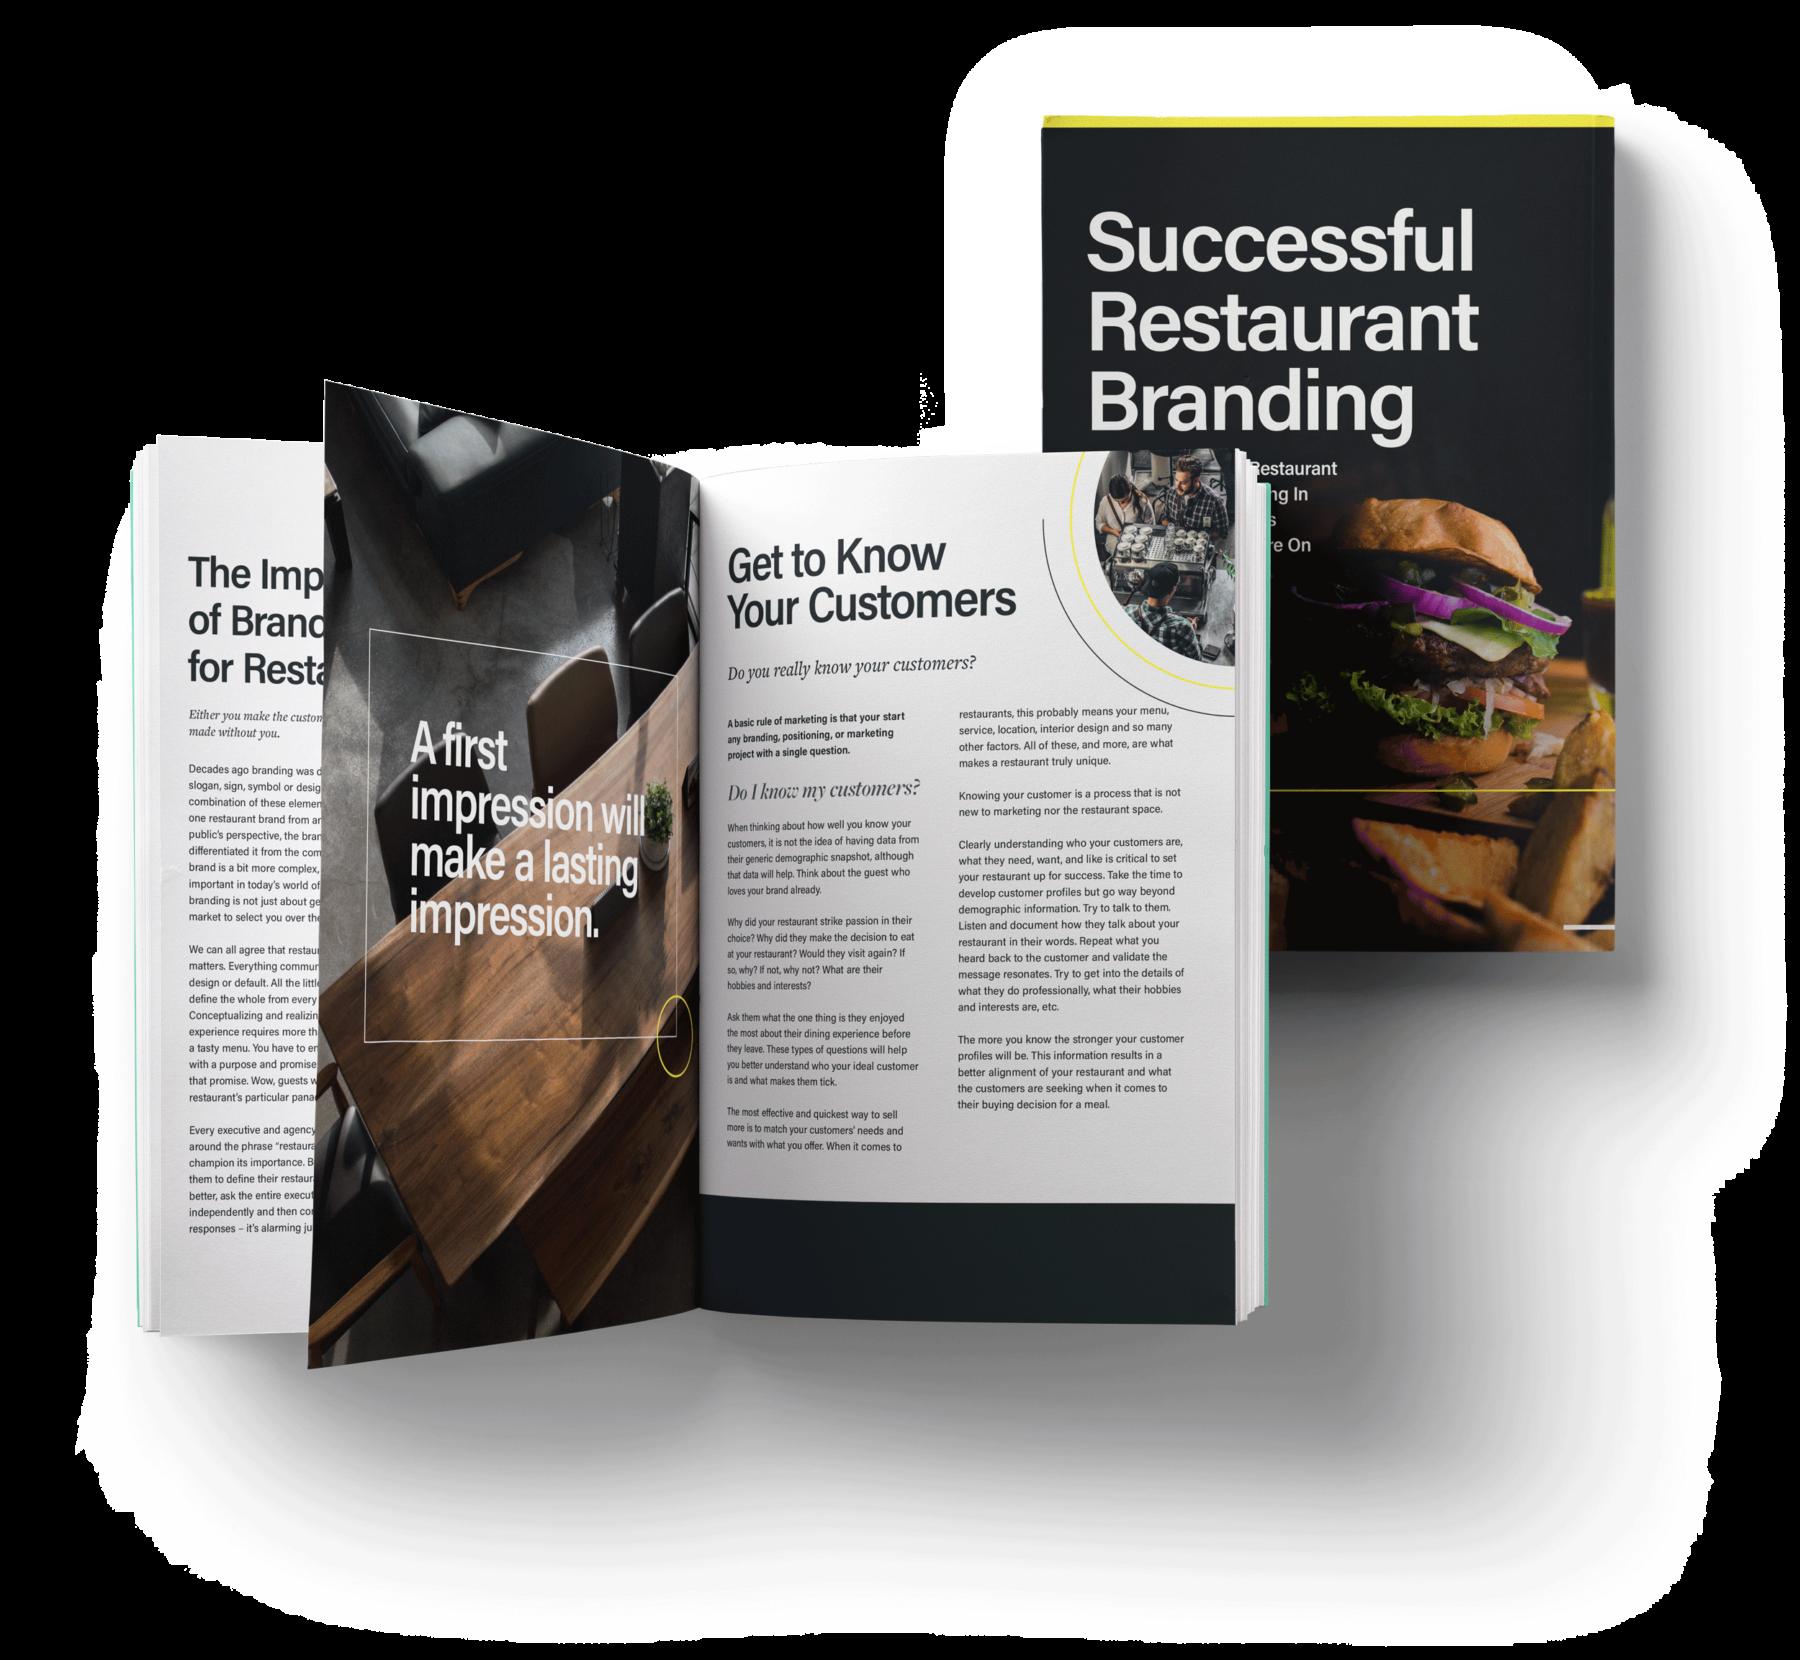 Successful Restaurant Branding